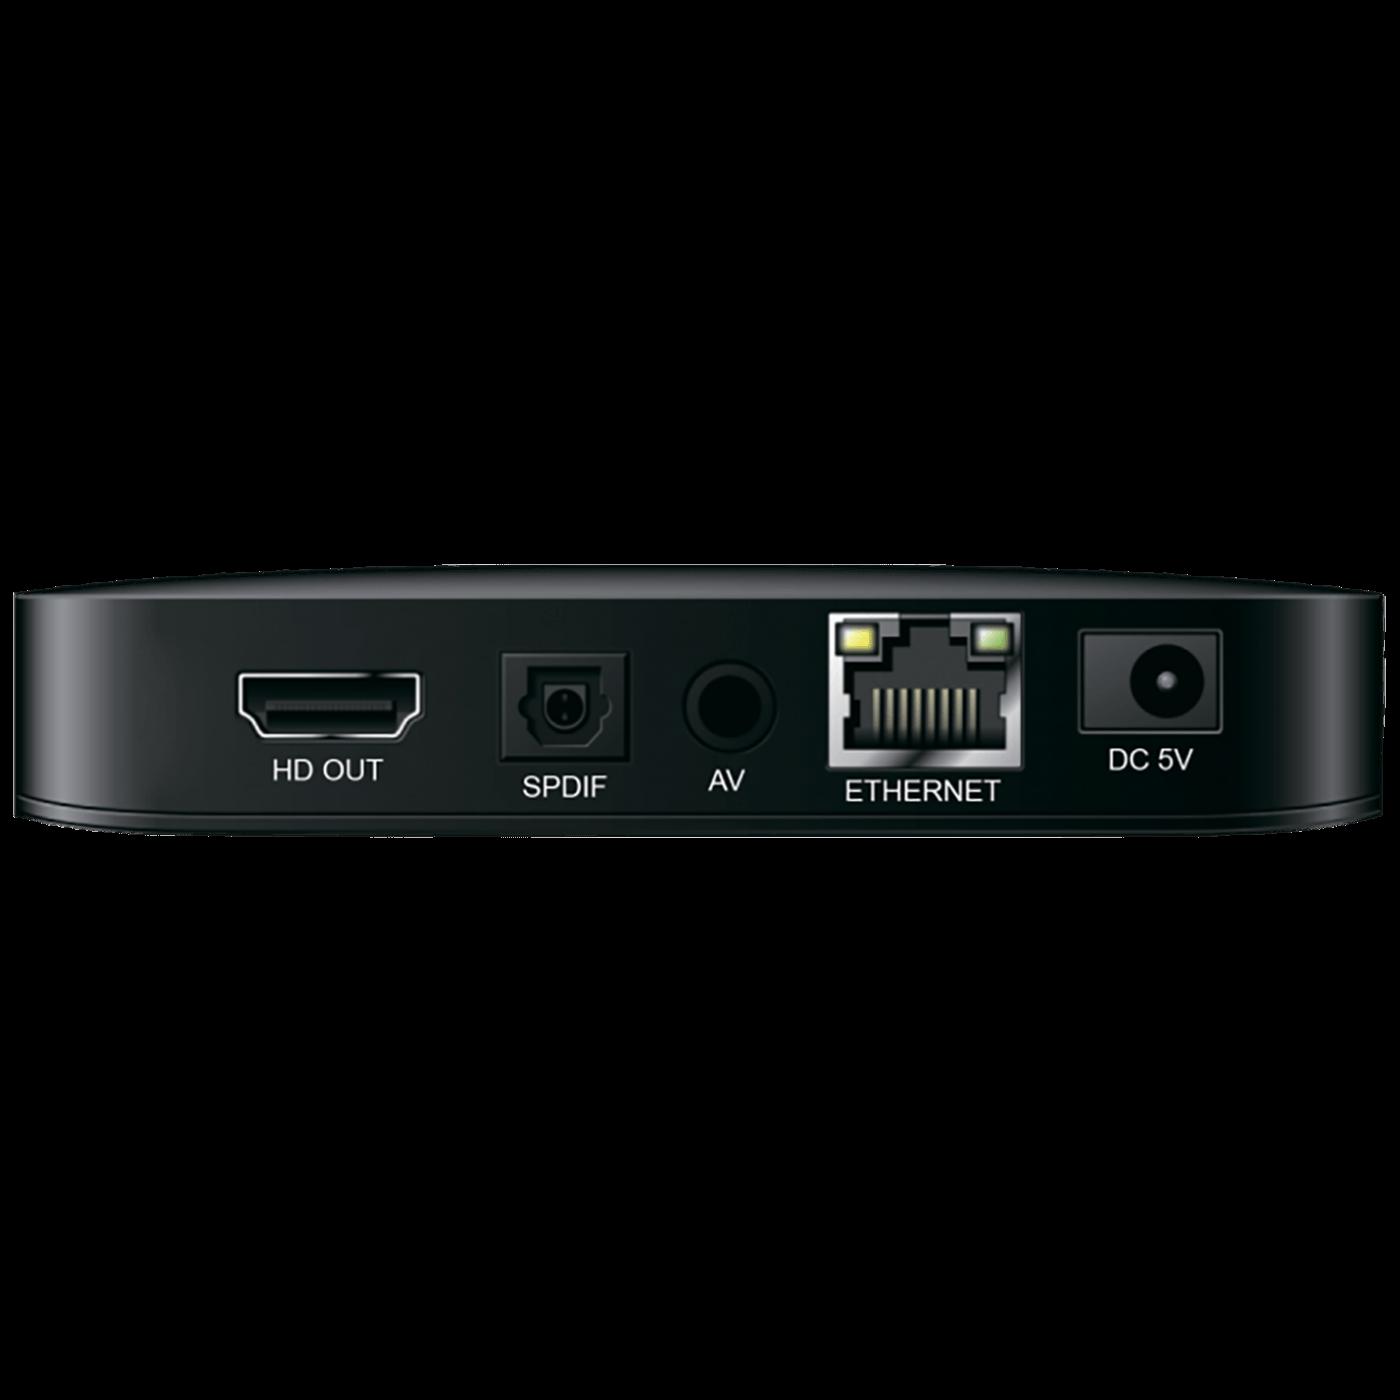 Prijemnik IPTV, Stalker midlleware, H.265